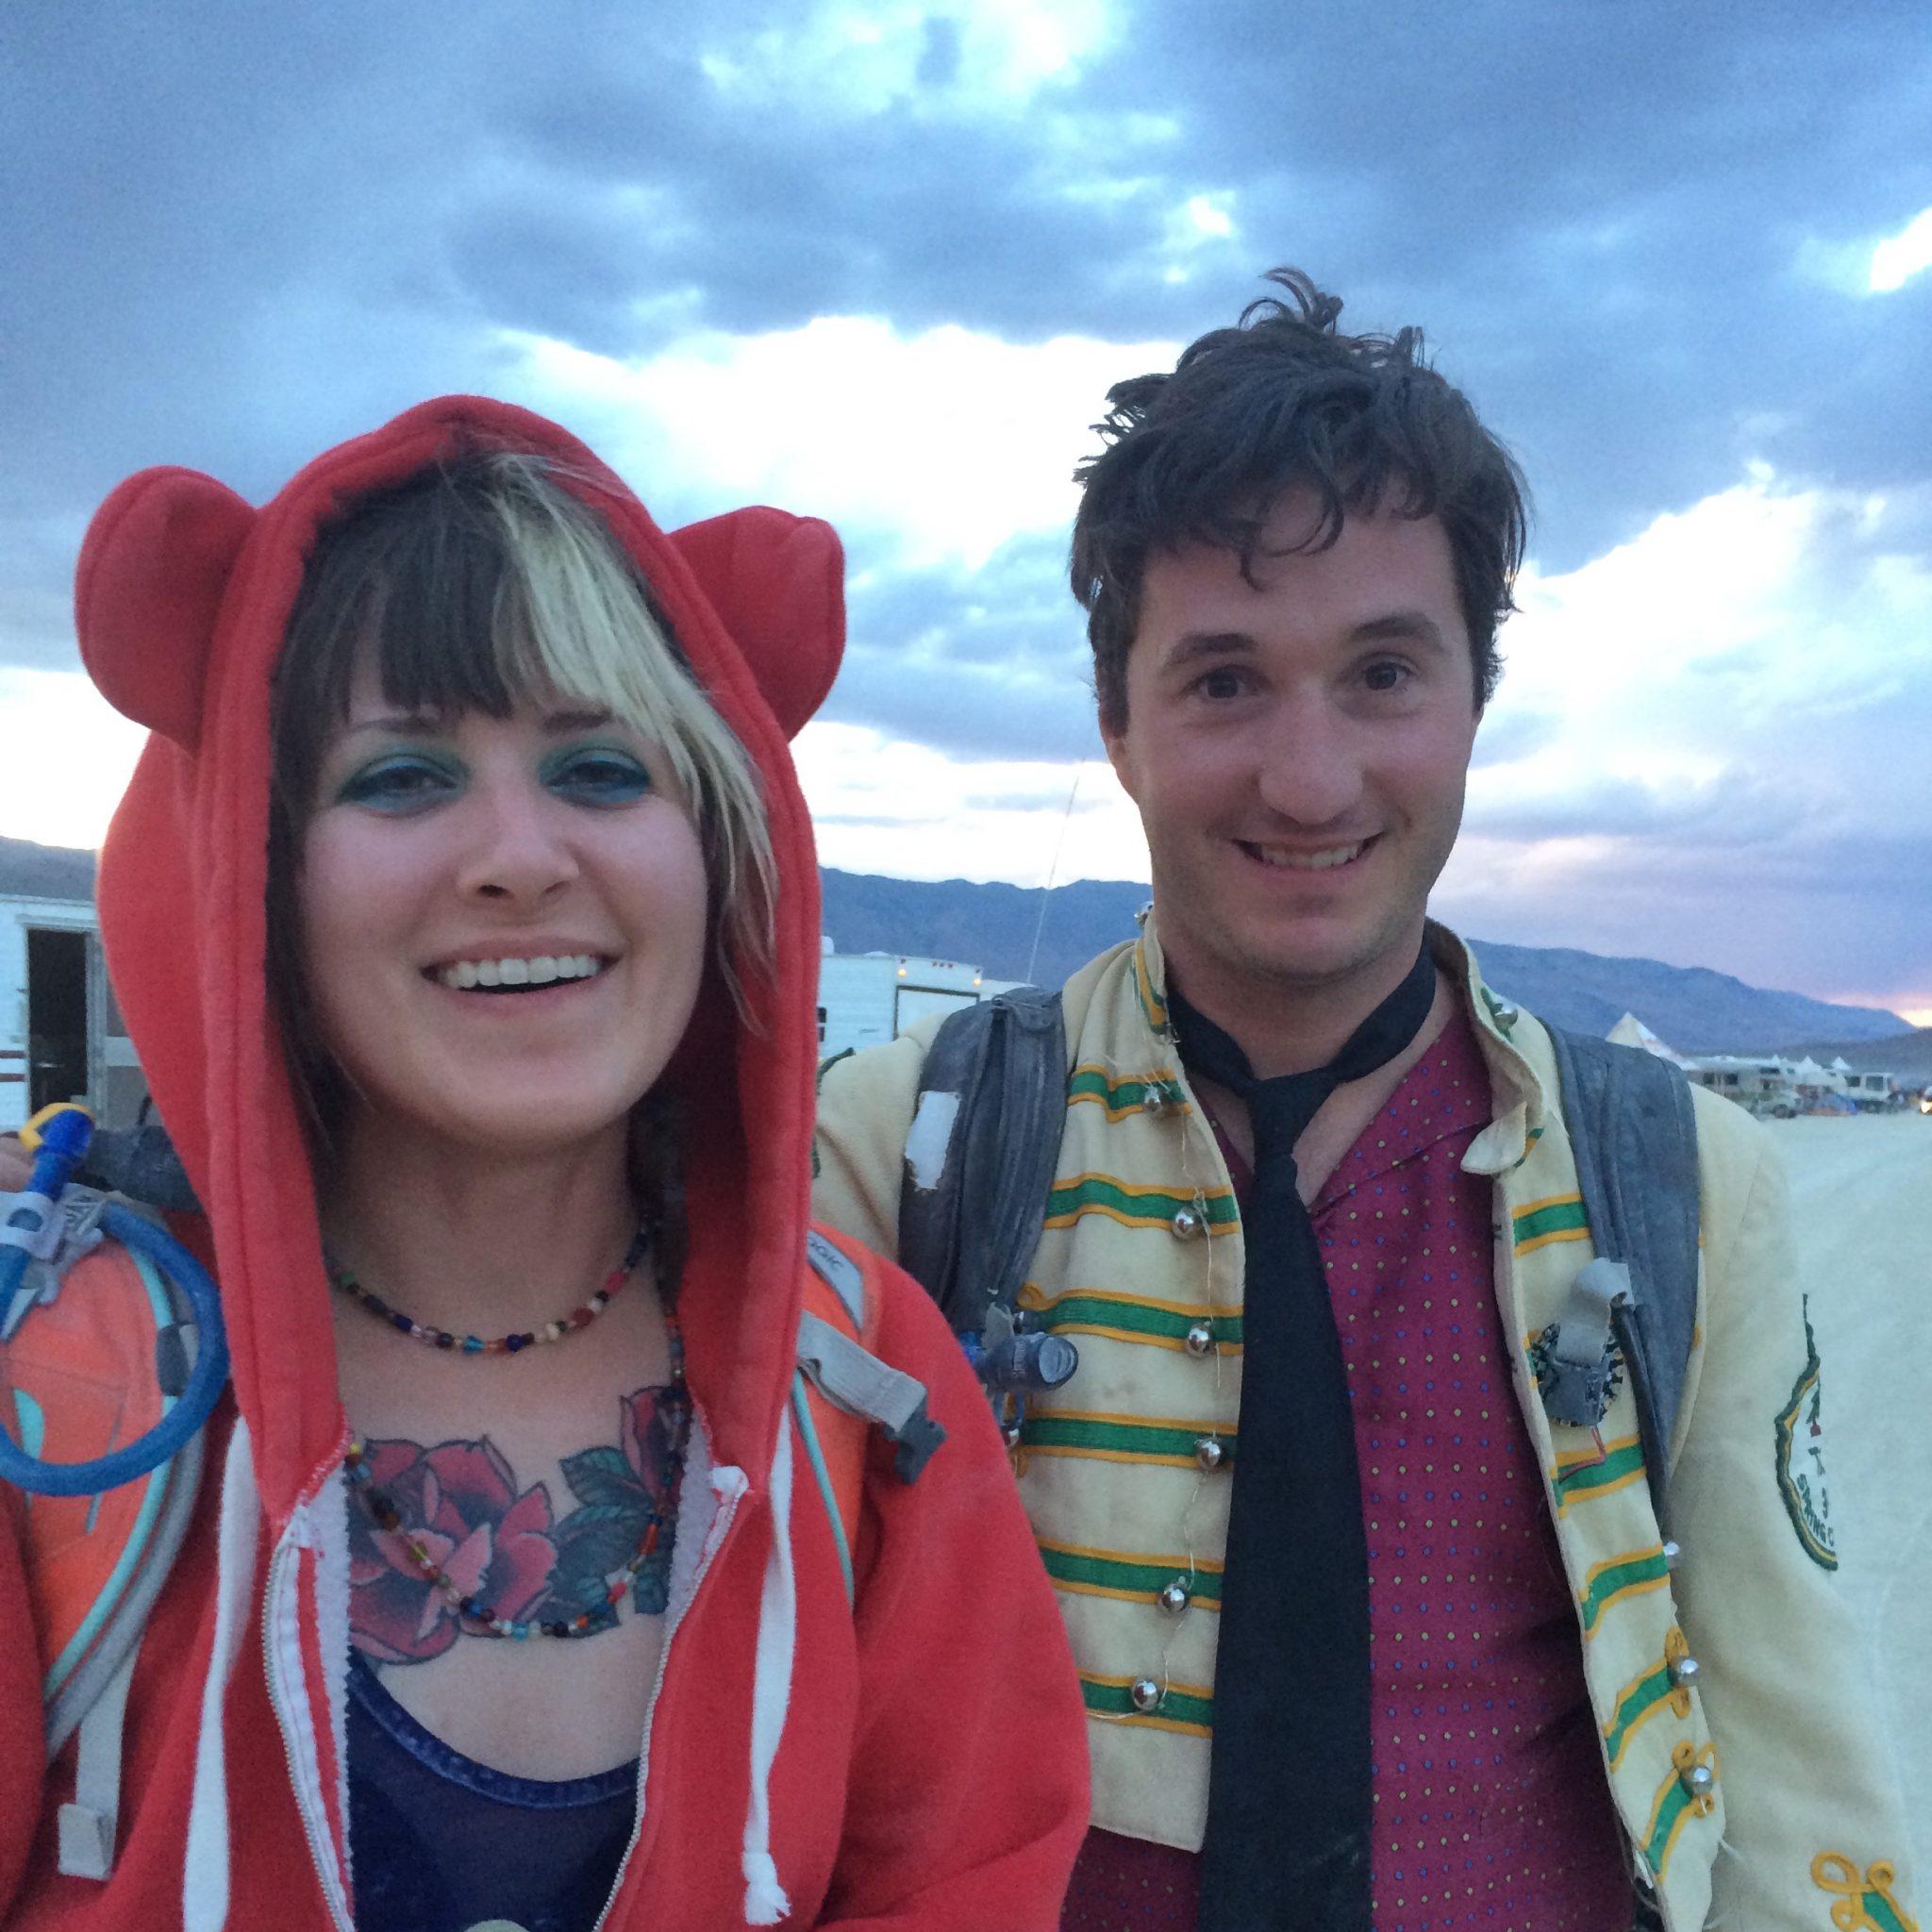 ridiculously happy at Burning Man